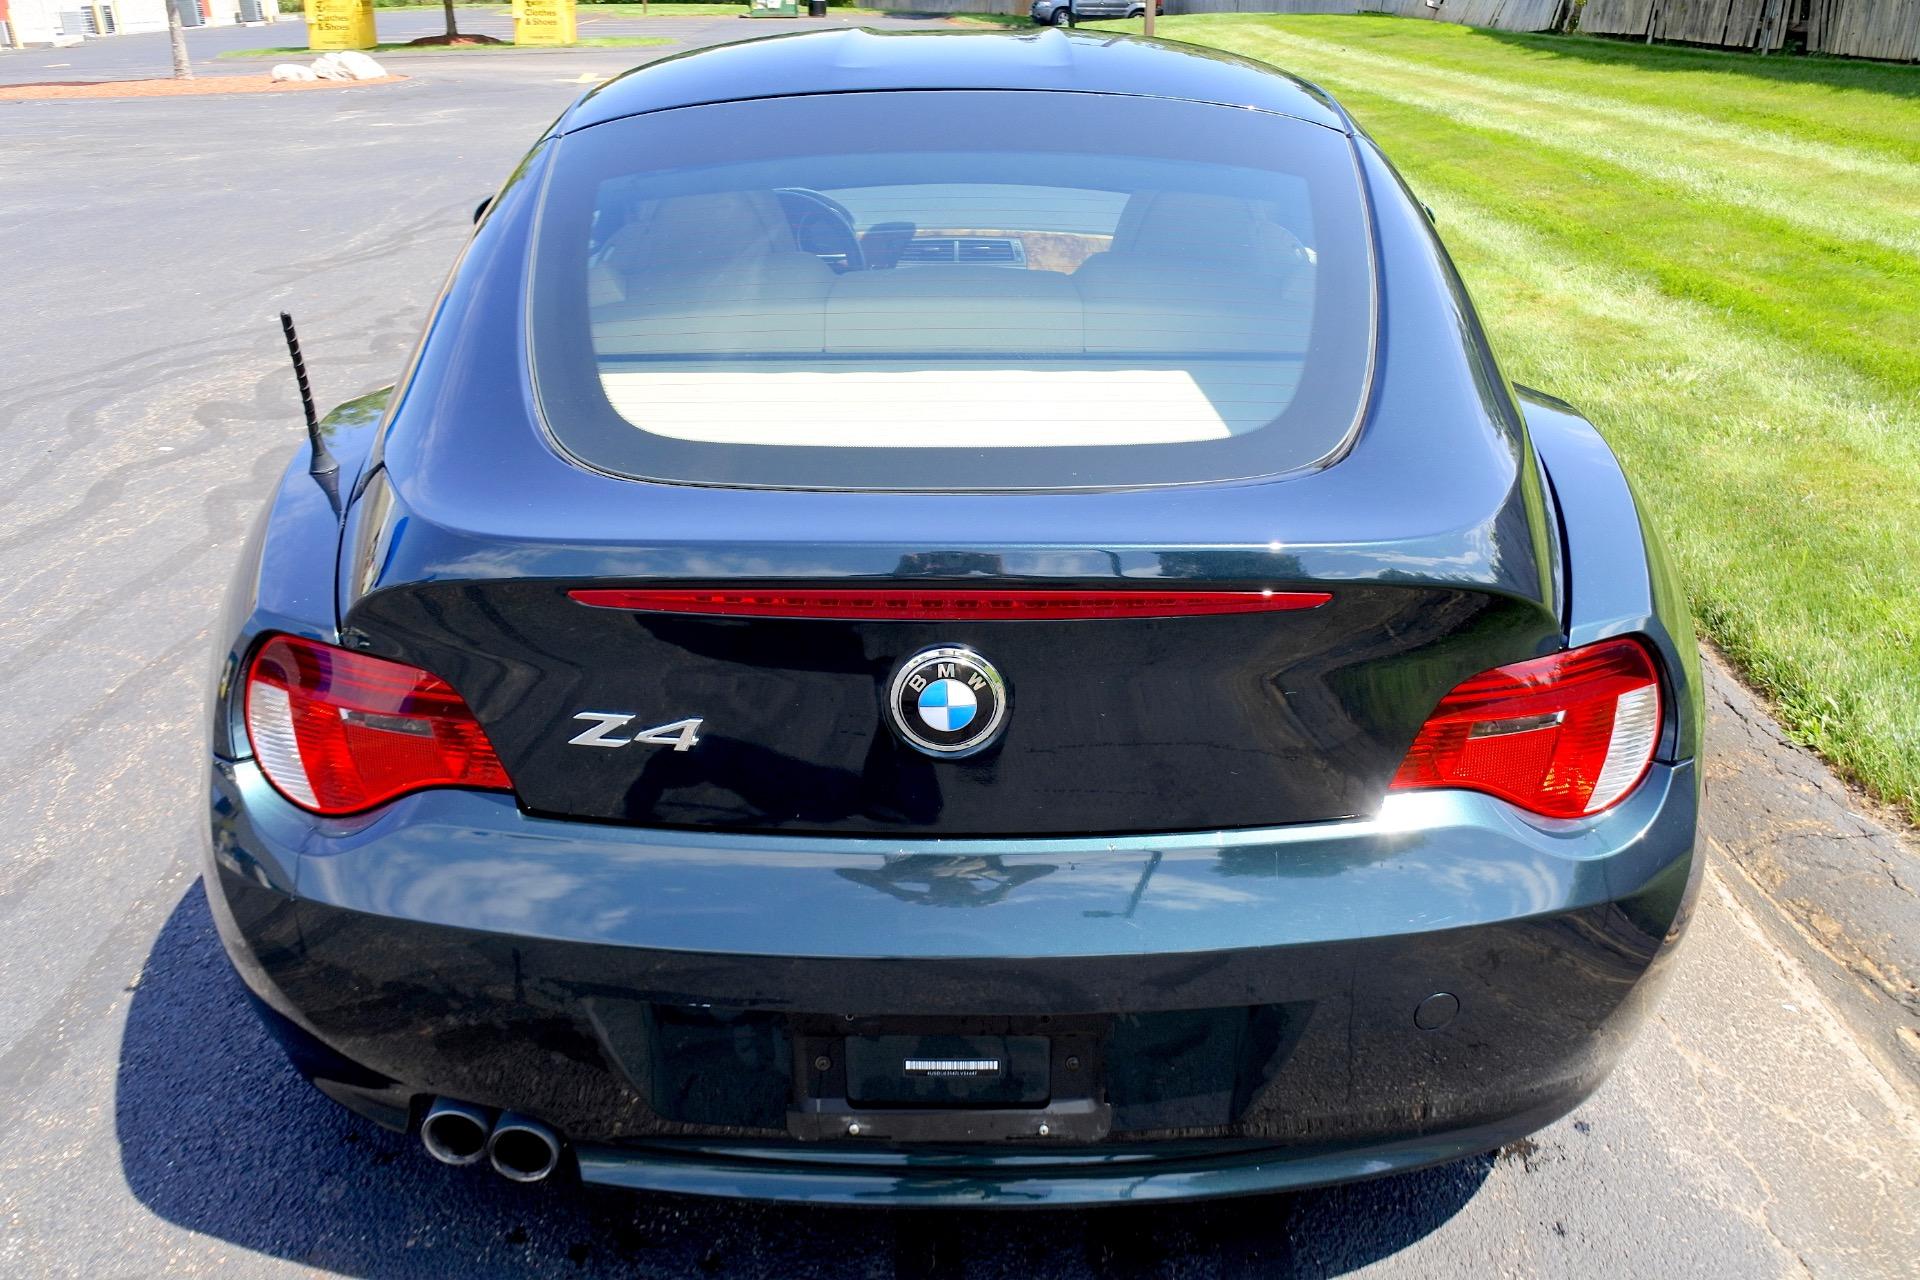 Used 2007 BMW Z4 2dr Coupe 3.0si Used 2007 BMW Z4 2dr Coupe 3.0si for sale  at Metro West Motorcars LLC in Shrewsbury MA 4